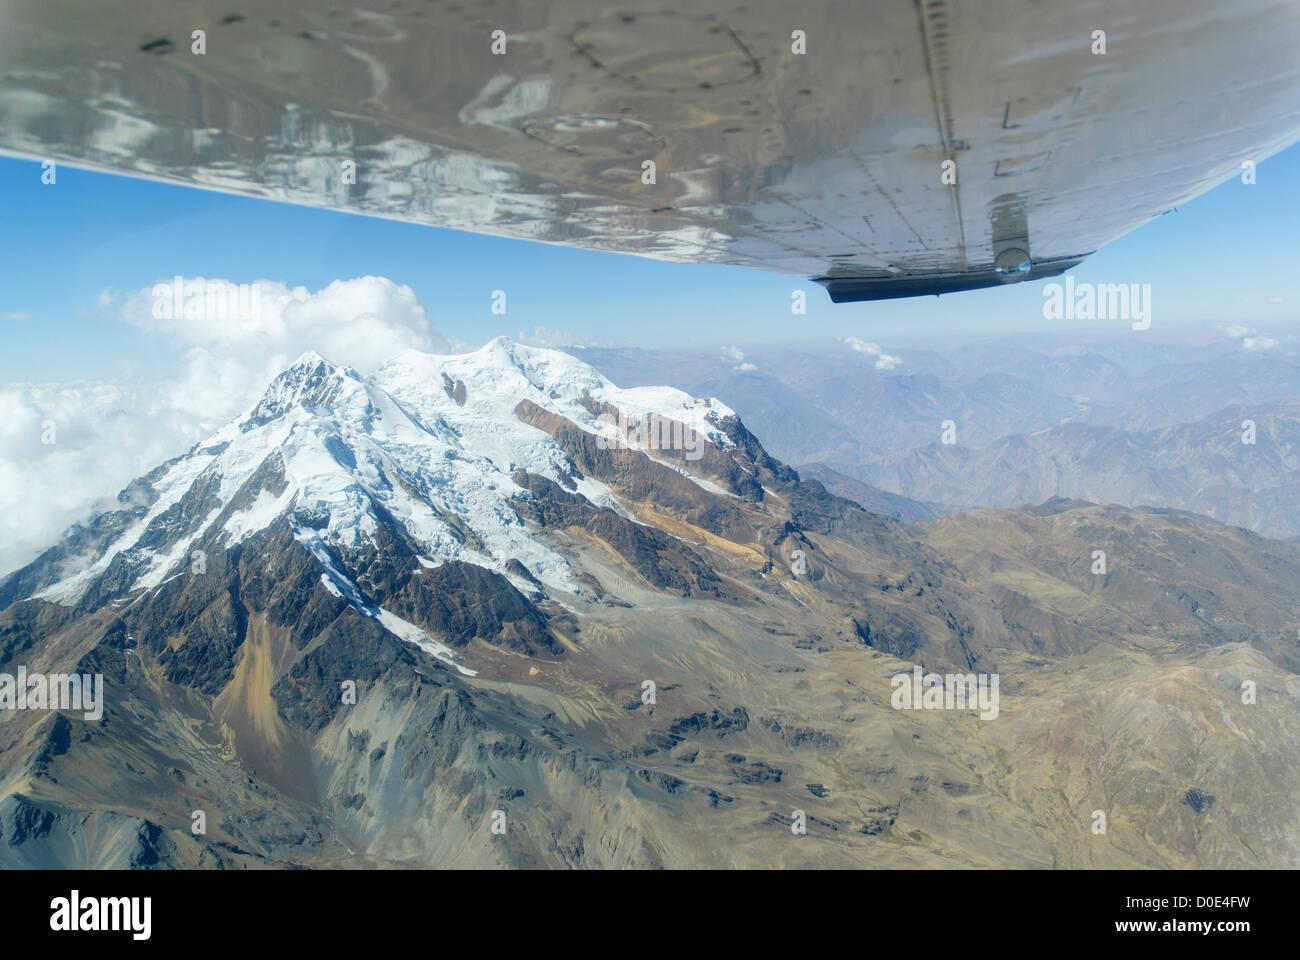 Aerial view of the mountain Illimani, Bolivia Stock Photo